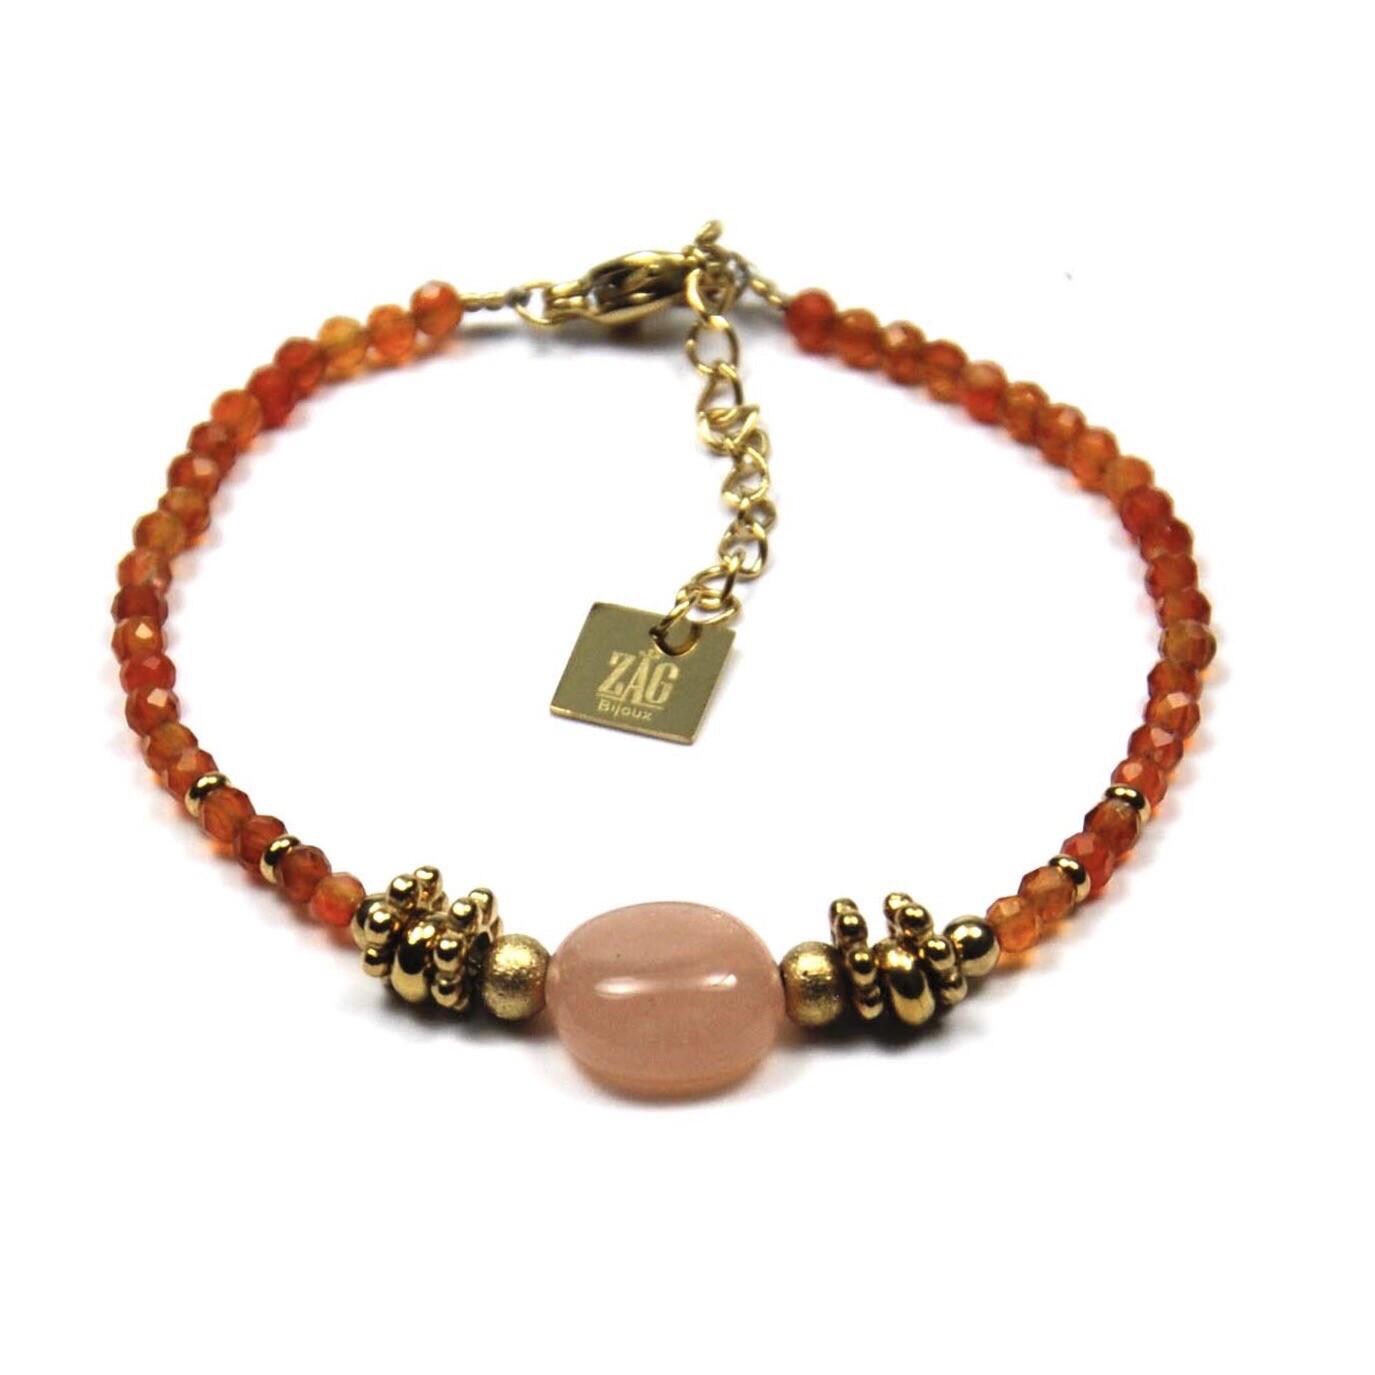 Zag Bijoux - Bracelet - Sun Stone